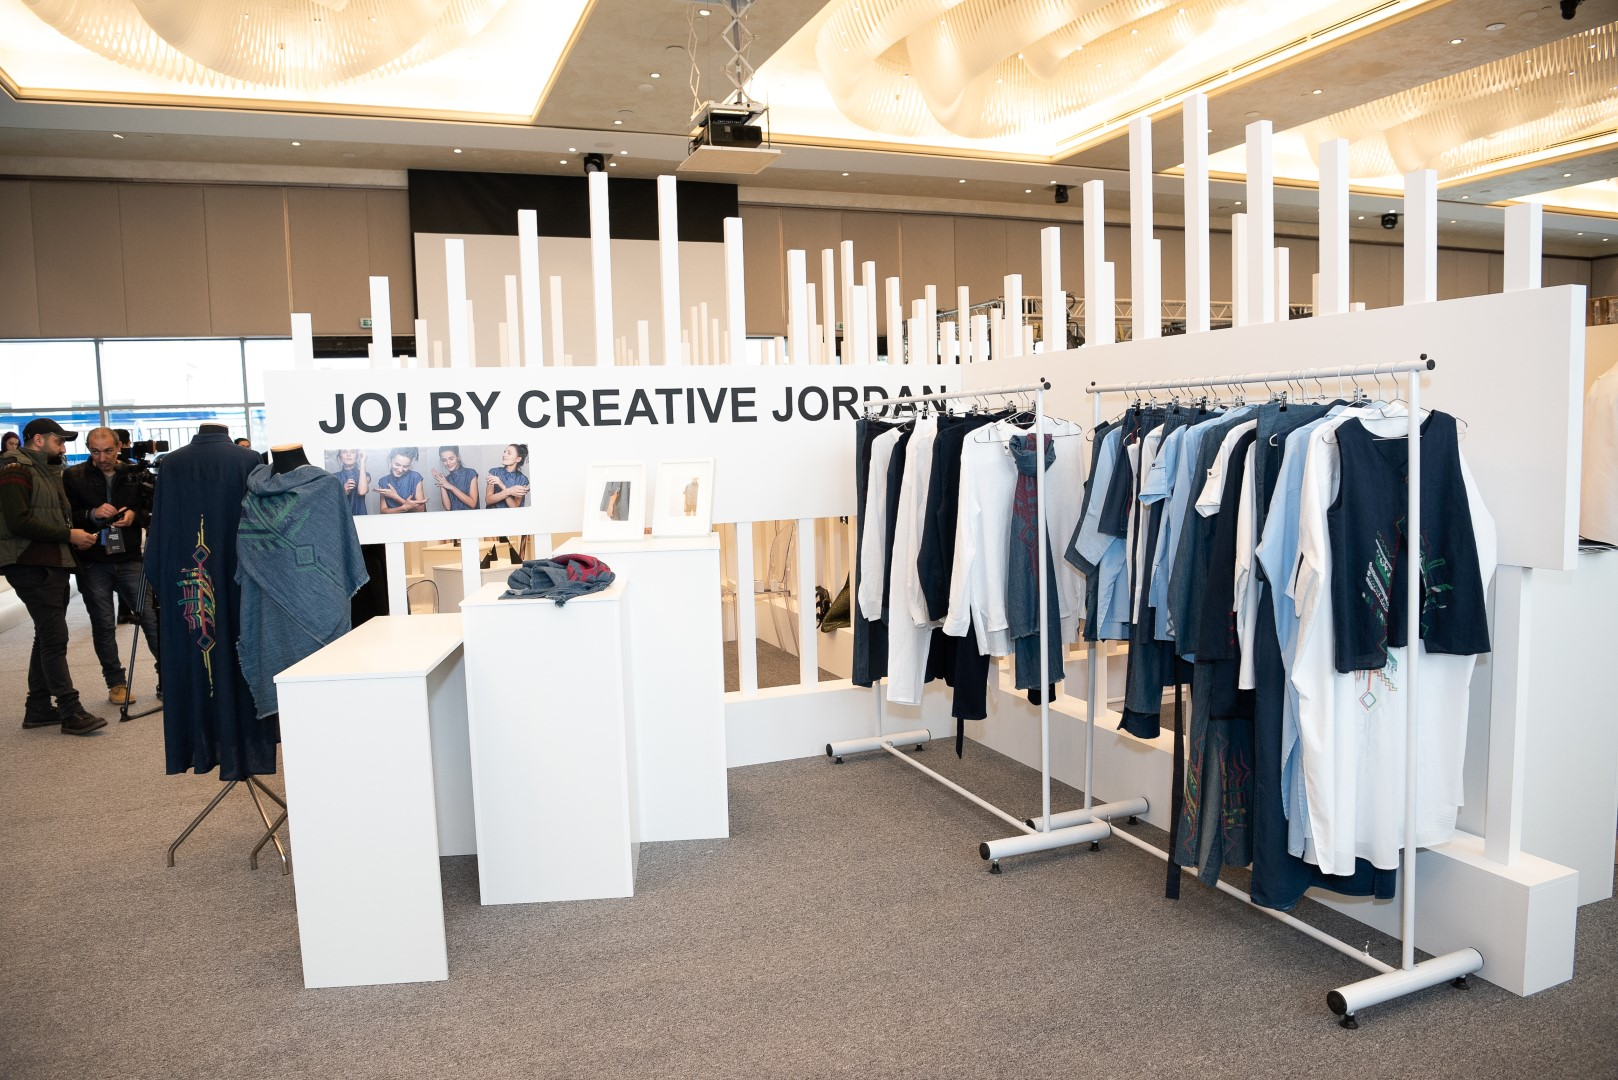 Creative Jordan